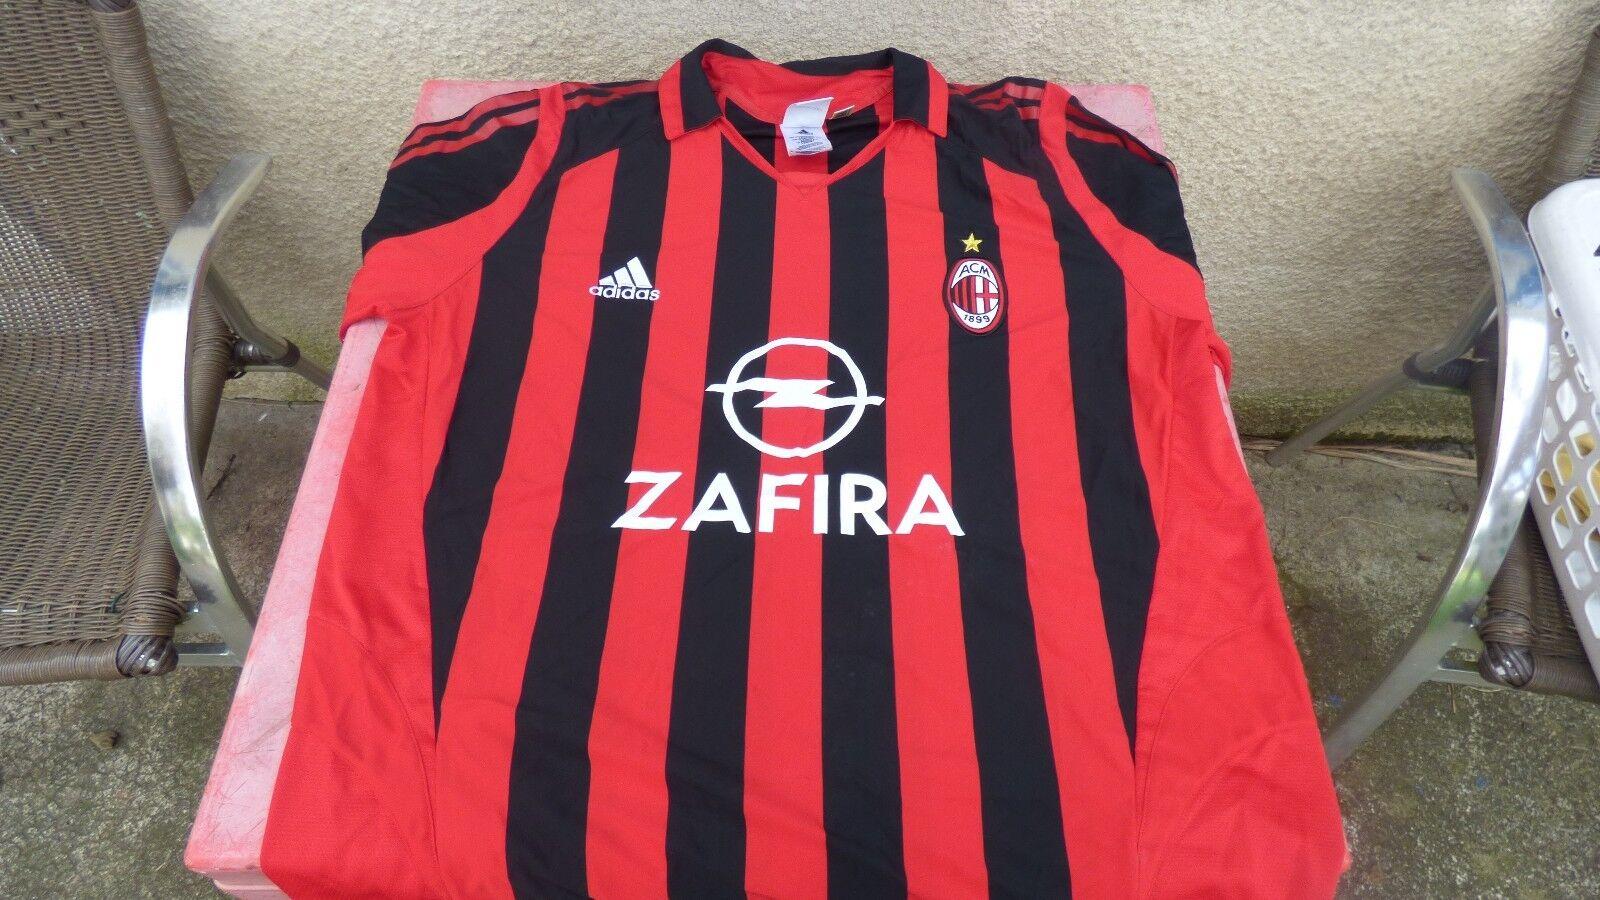 Fußballtrikot vintage Milan Adidas Zafira Zafira Zafira XL b377e0